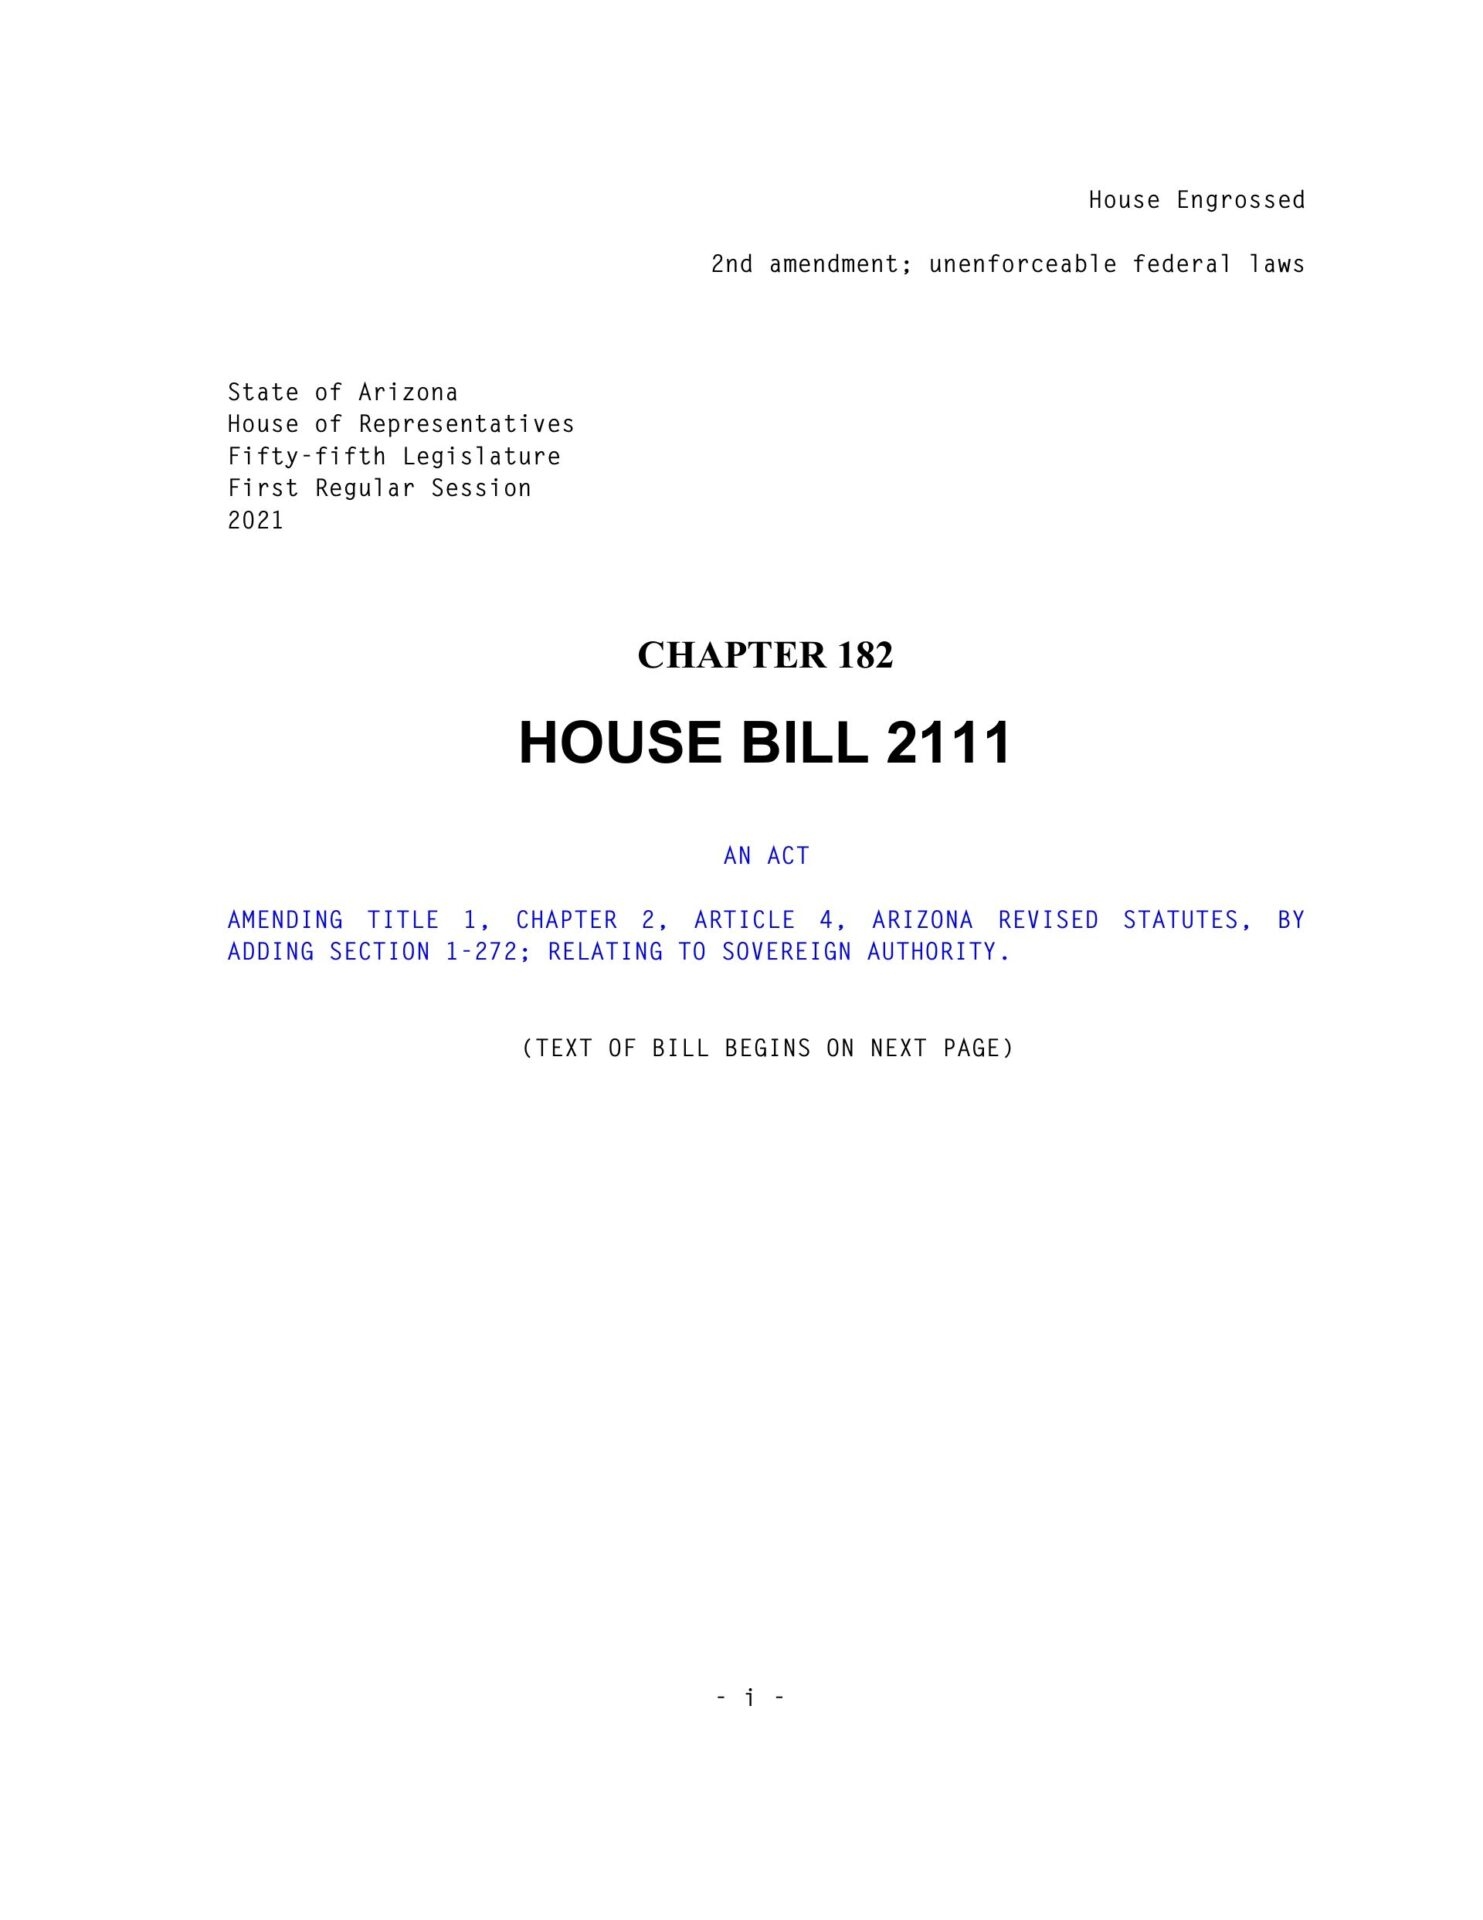 Arizona 2nd Amendment Firearm Freedom Act PG1